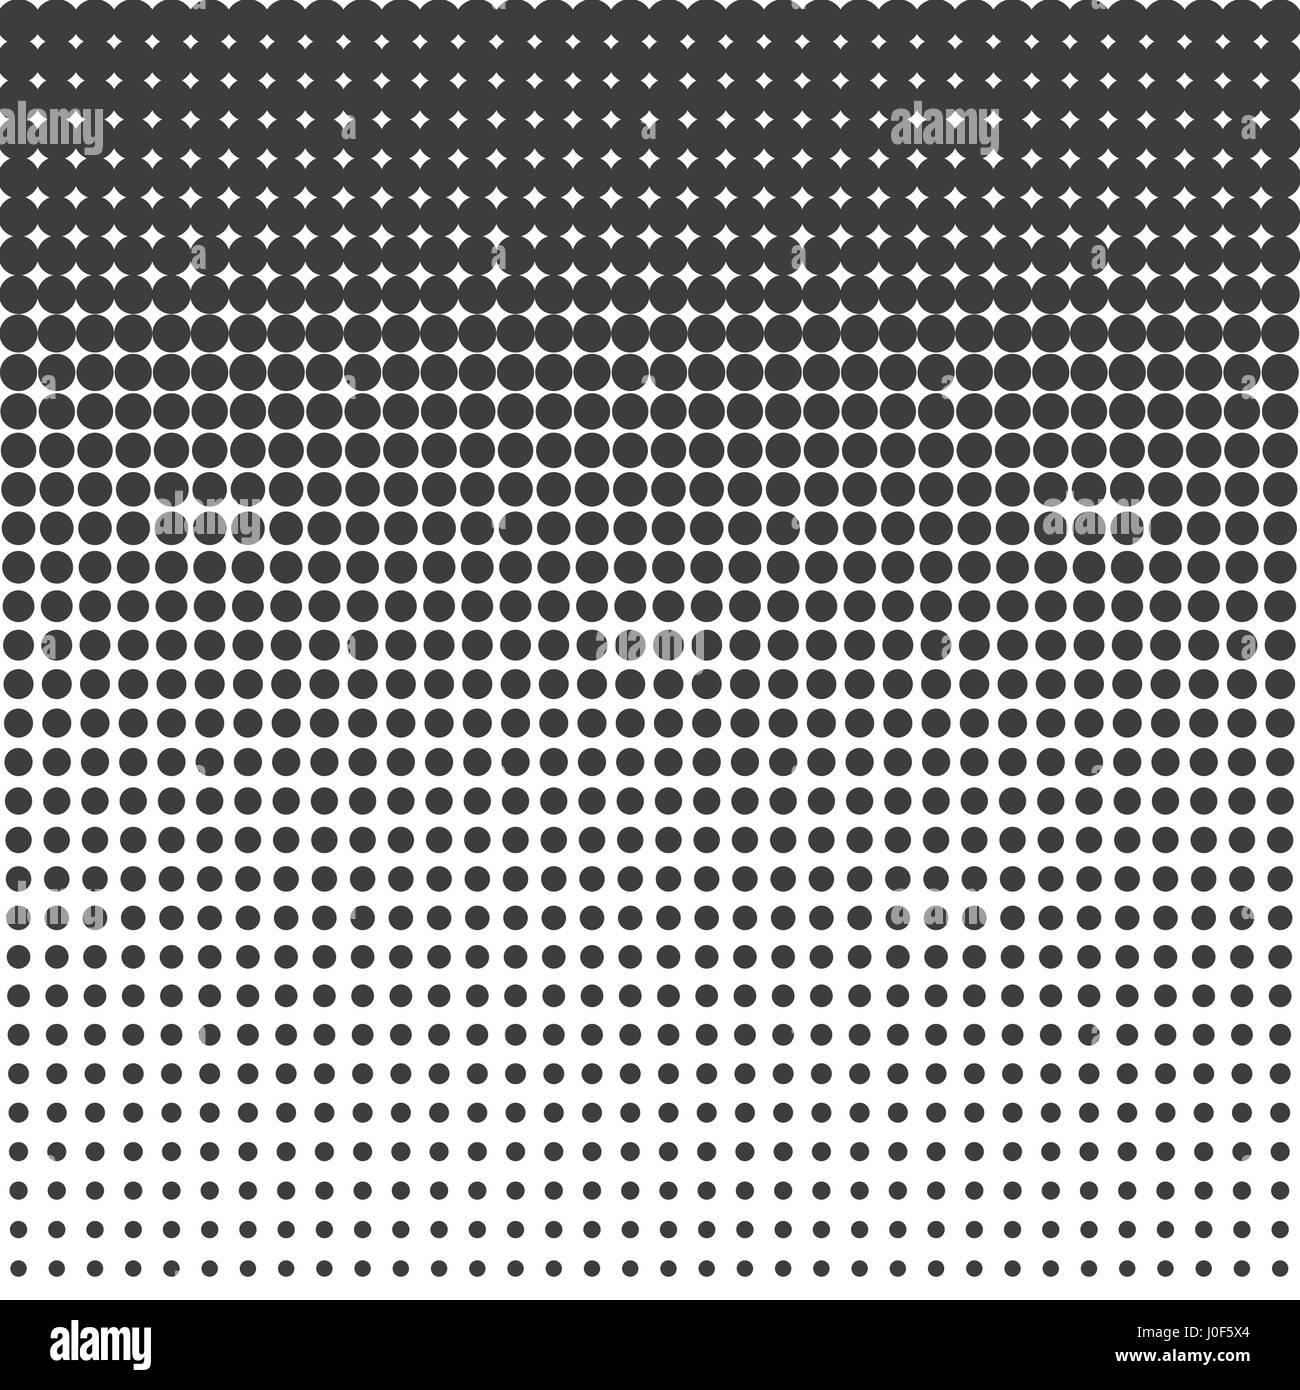 Halftone dots pattern - Stock Image